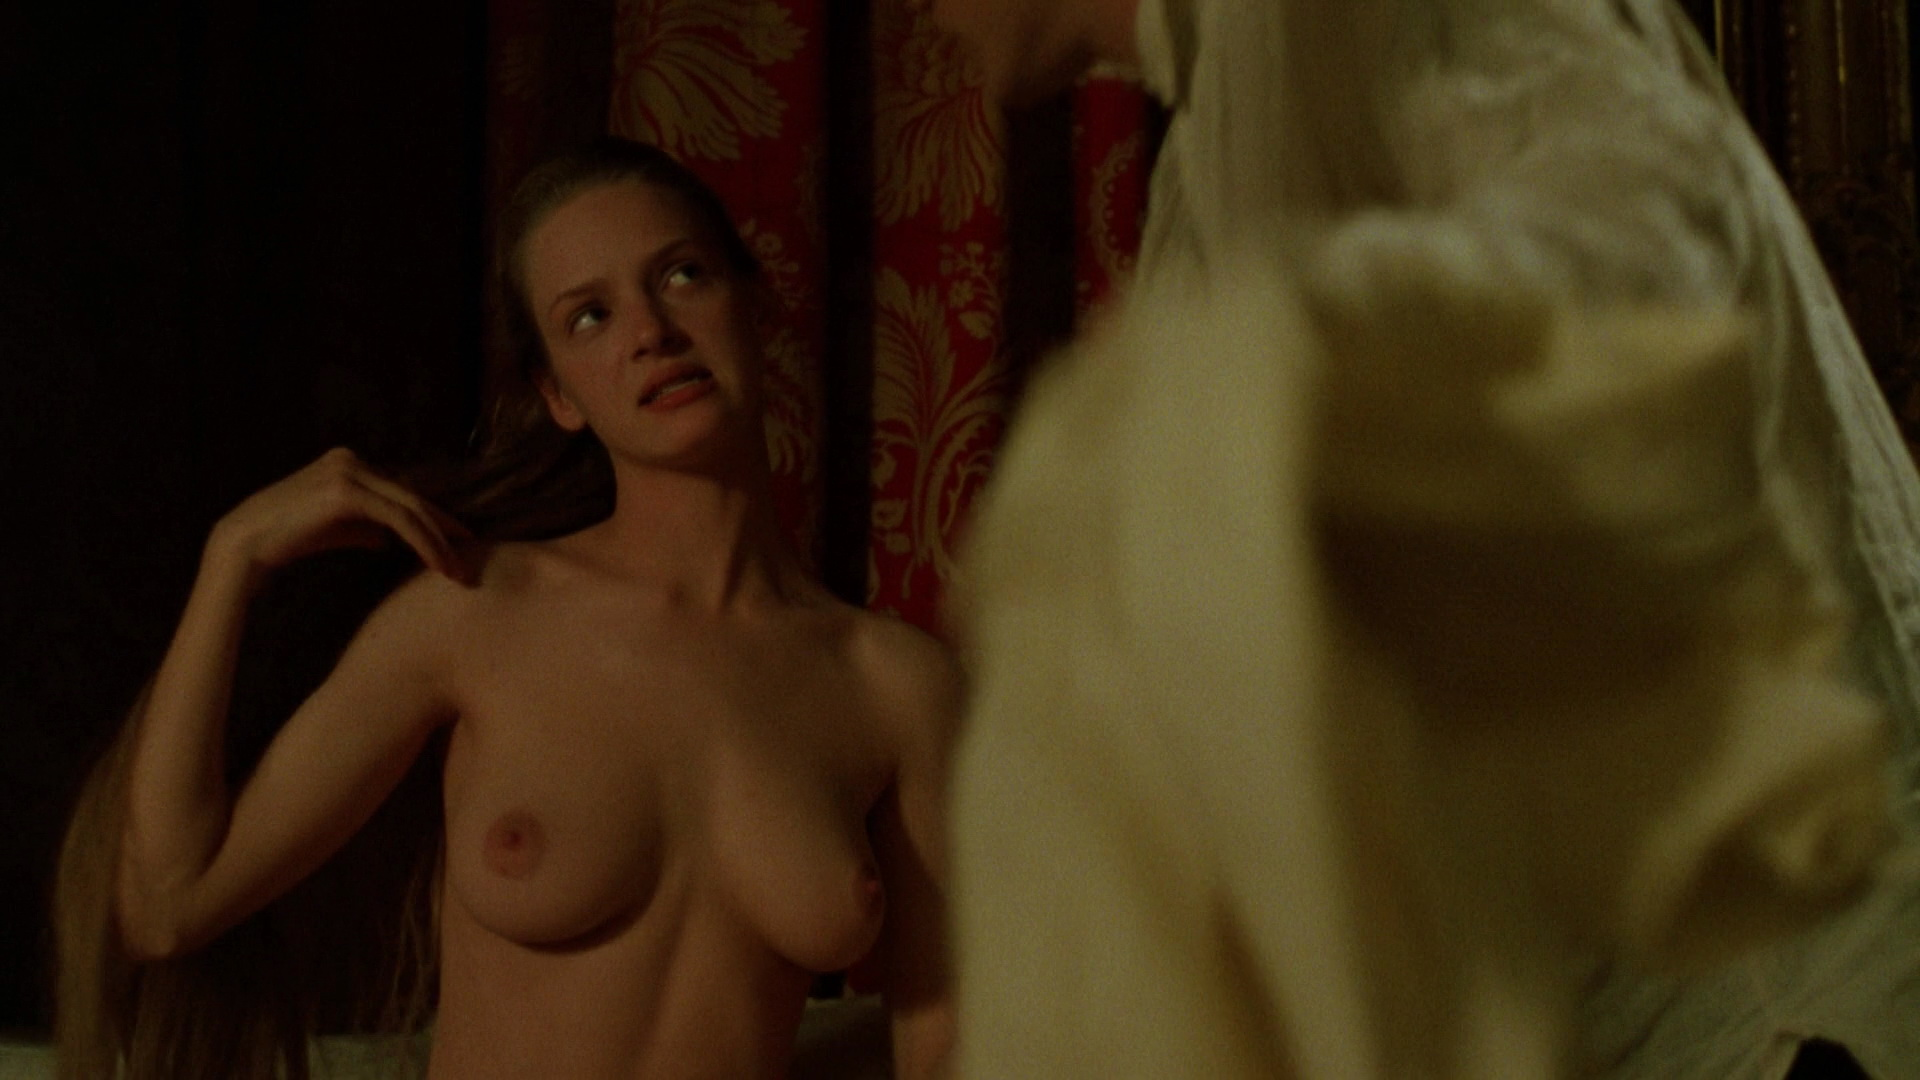 Sex Uma Thurman nude (26 foto and video), Pussy, Paparazzi, Selfie, braless 2020